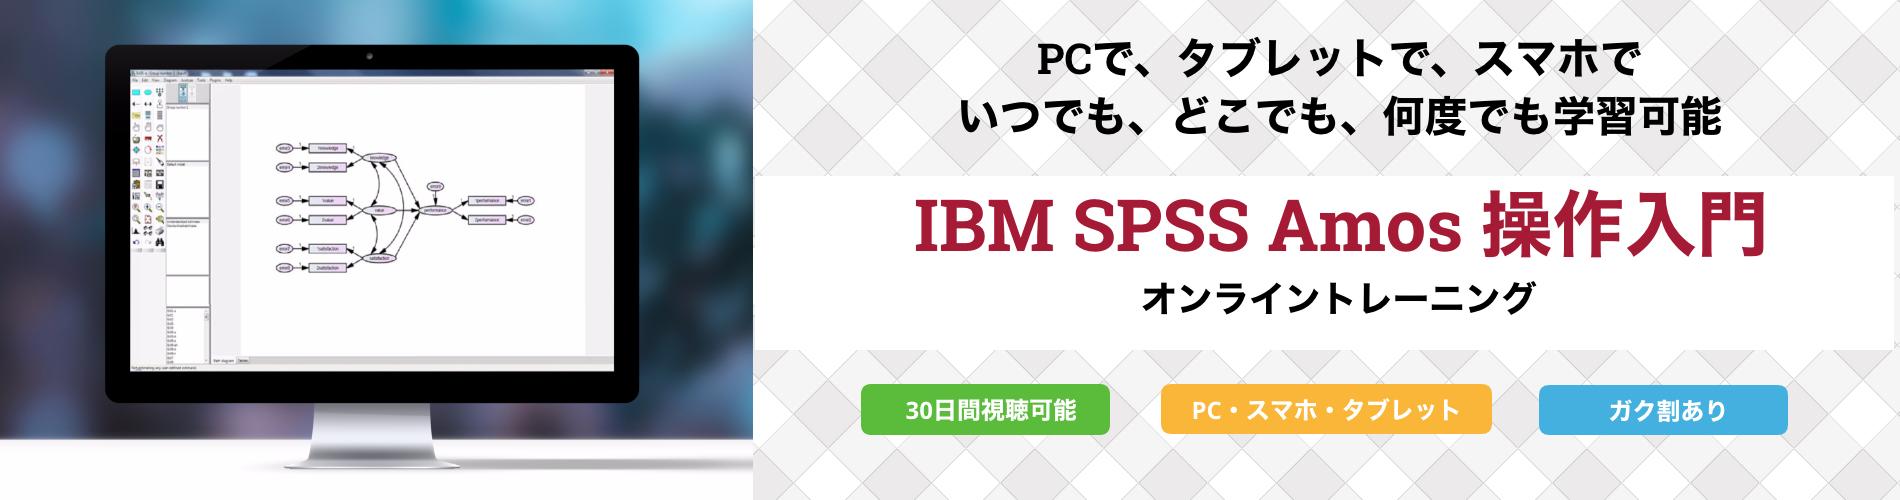 IBM SPSS Amos 操作入門 オンライントレーニング